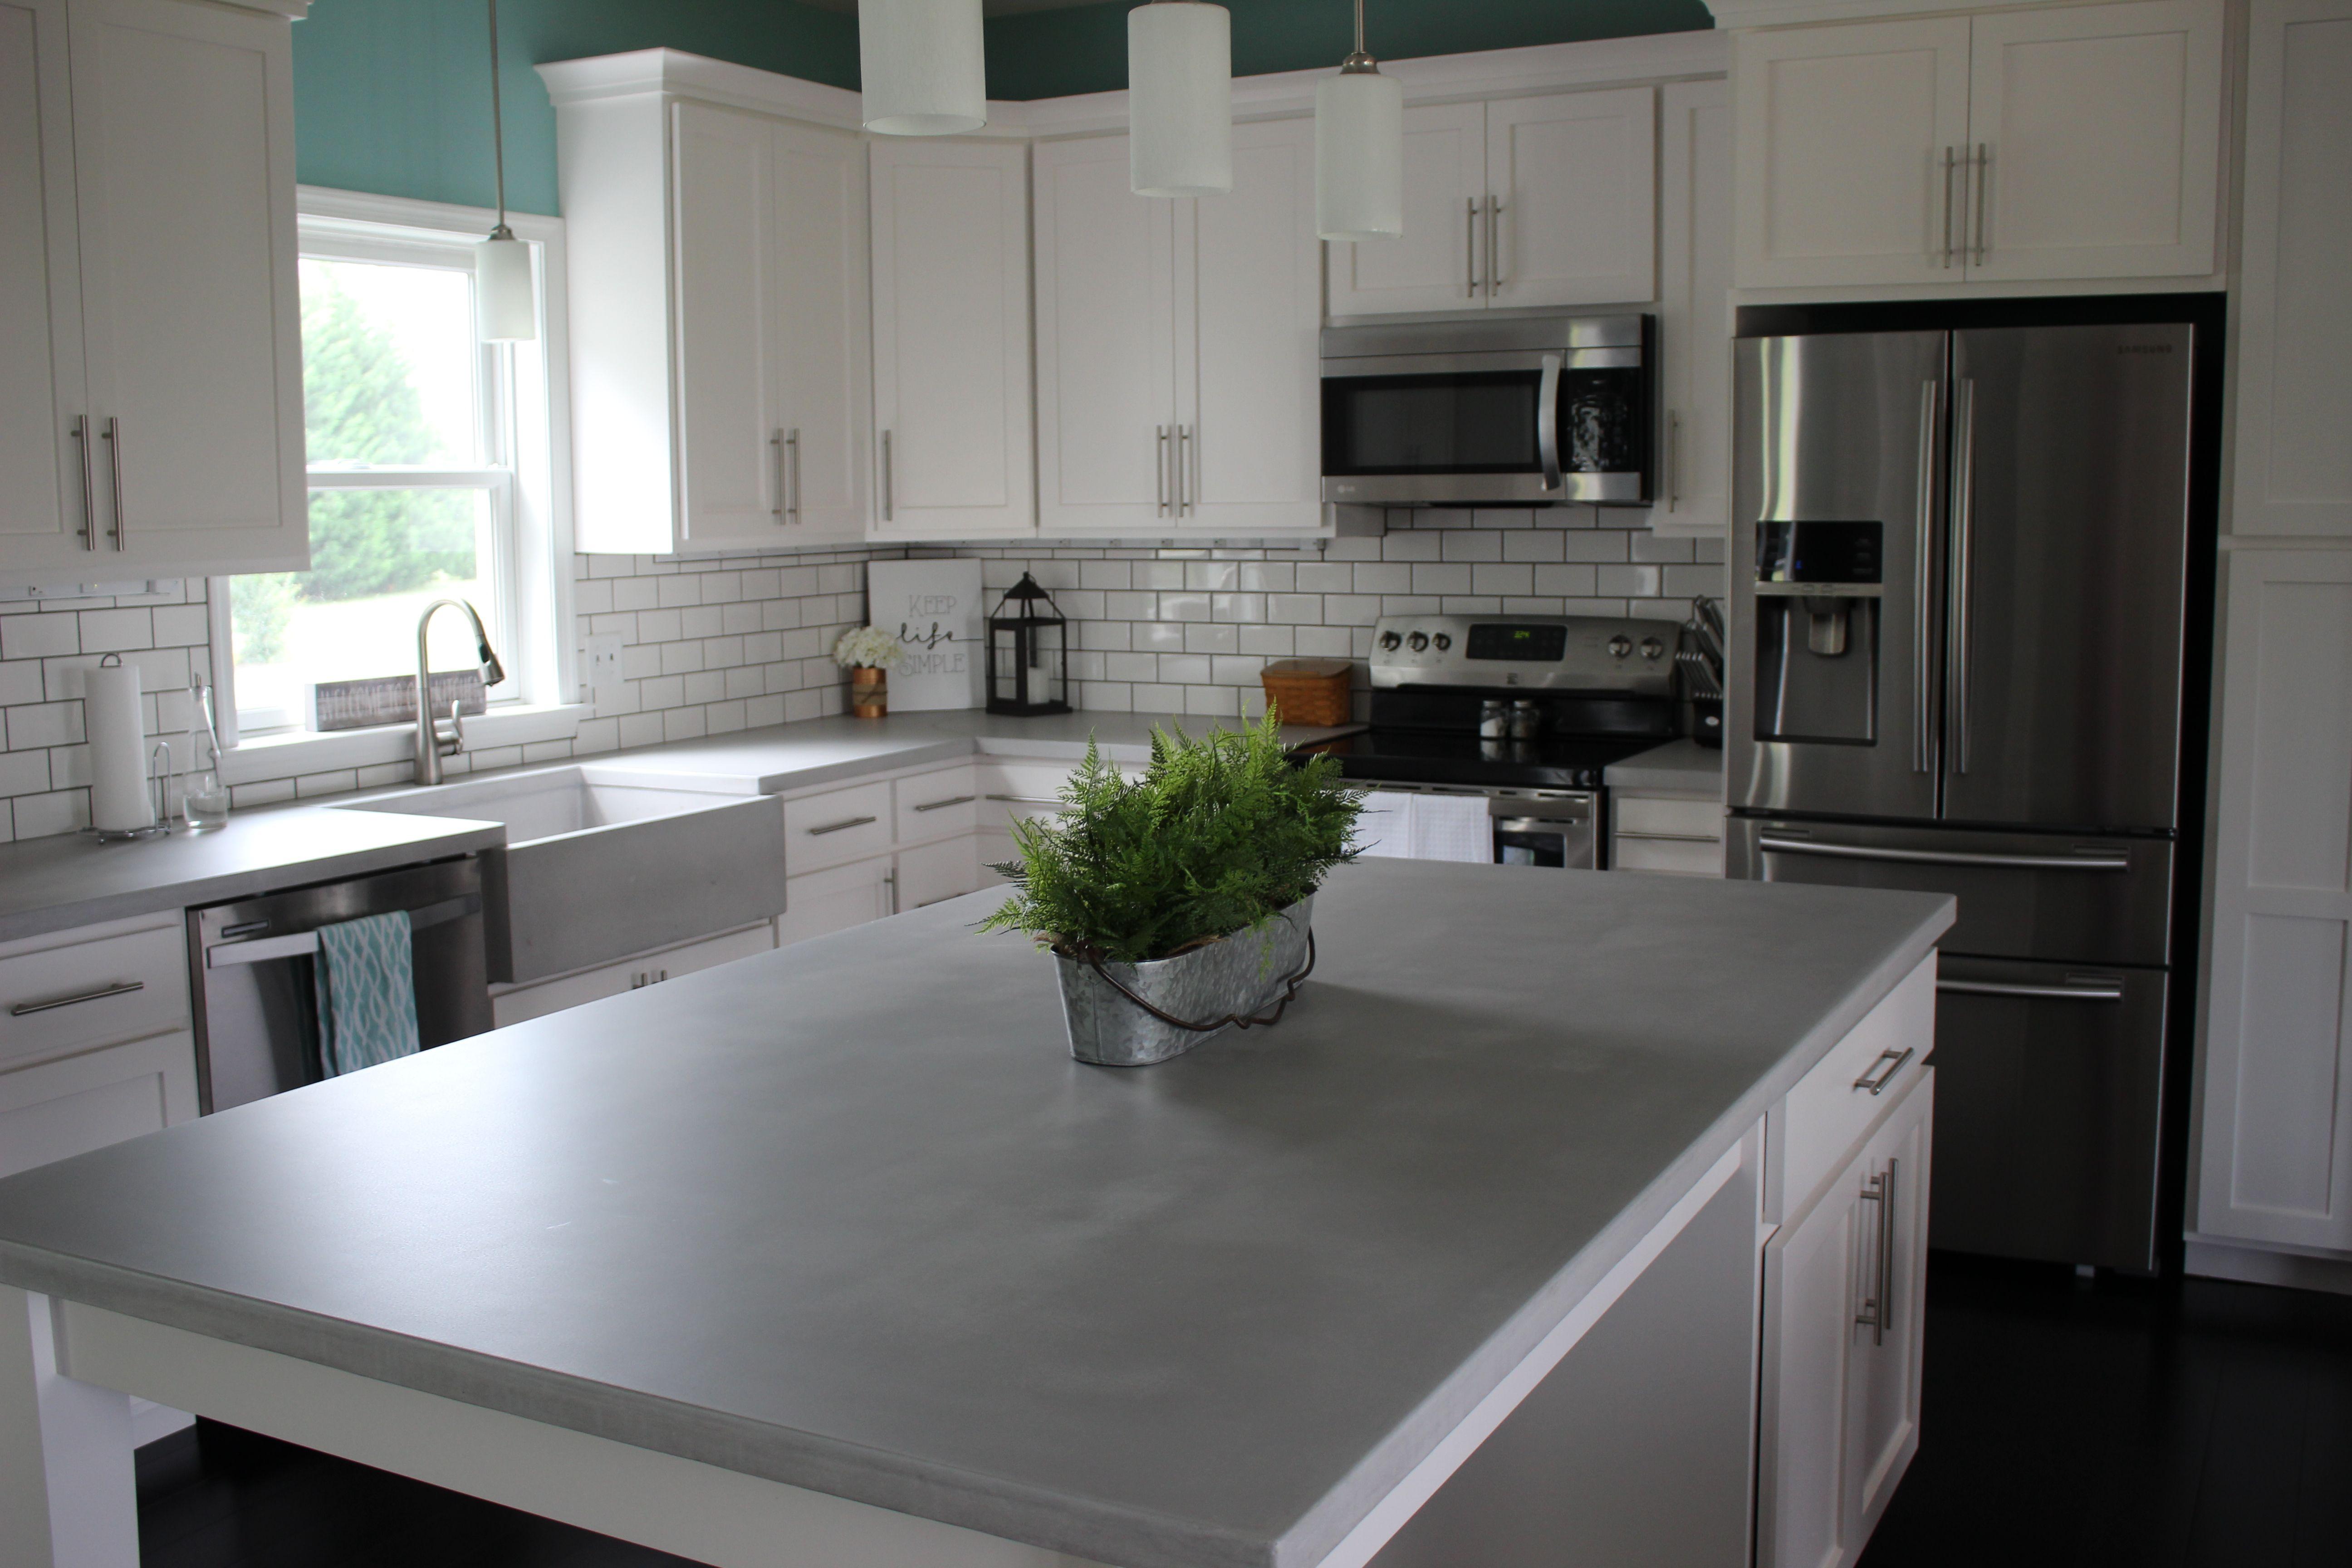 lowes countertop photo gallery countertops composite cabinet kitchen tops granite charming quartz concrete fake ideas as island